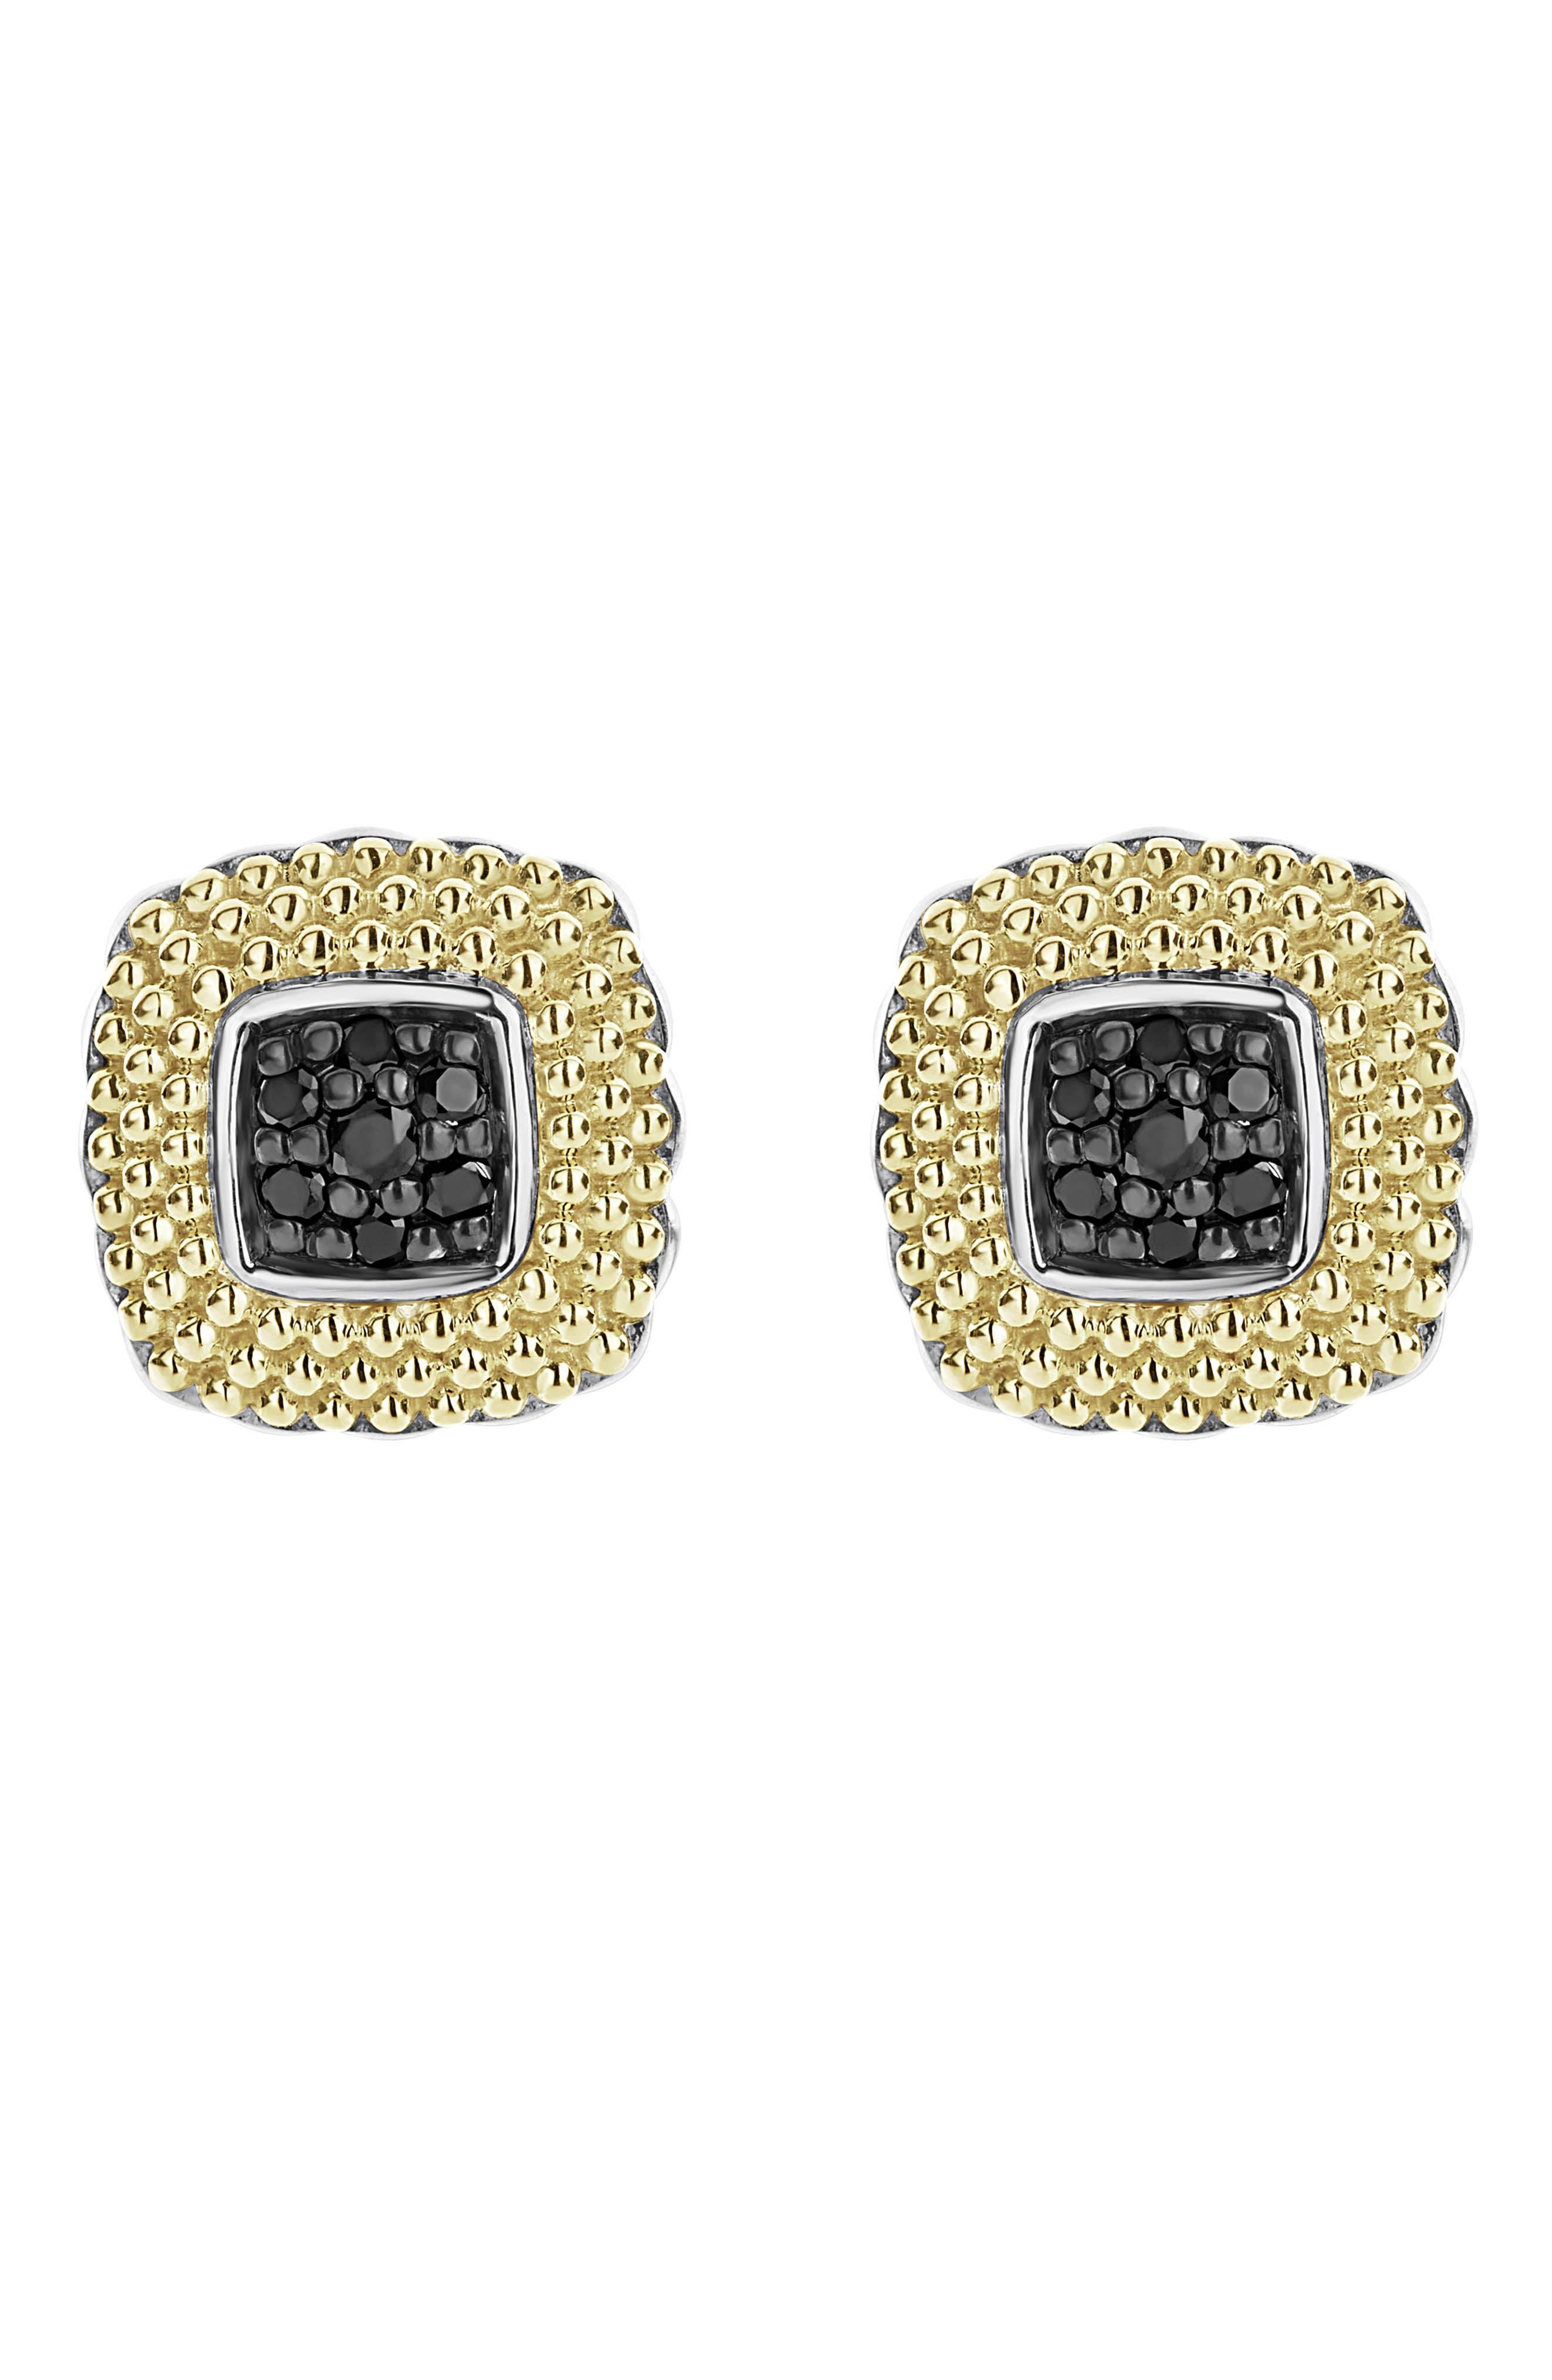 Diamond Lux Black Diamond Square Stud Earrings in Silver/ Gold/ Black Diamond